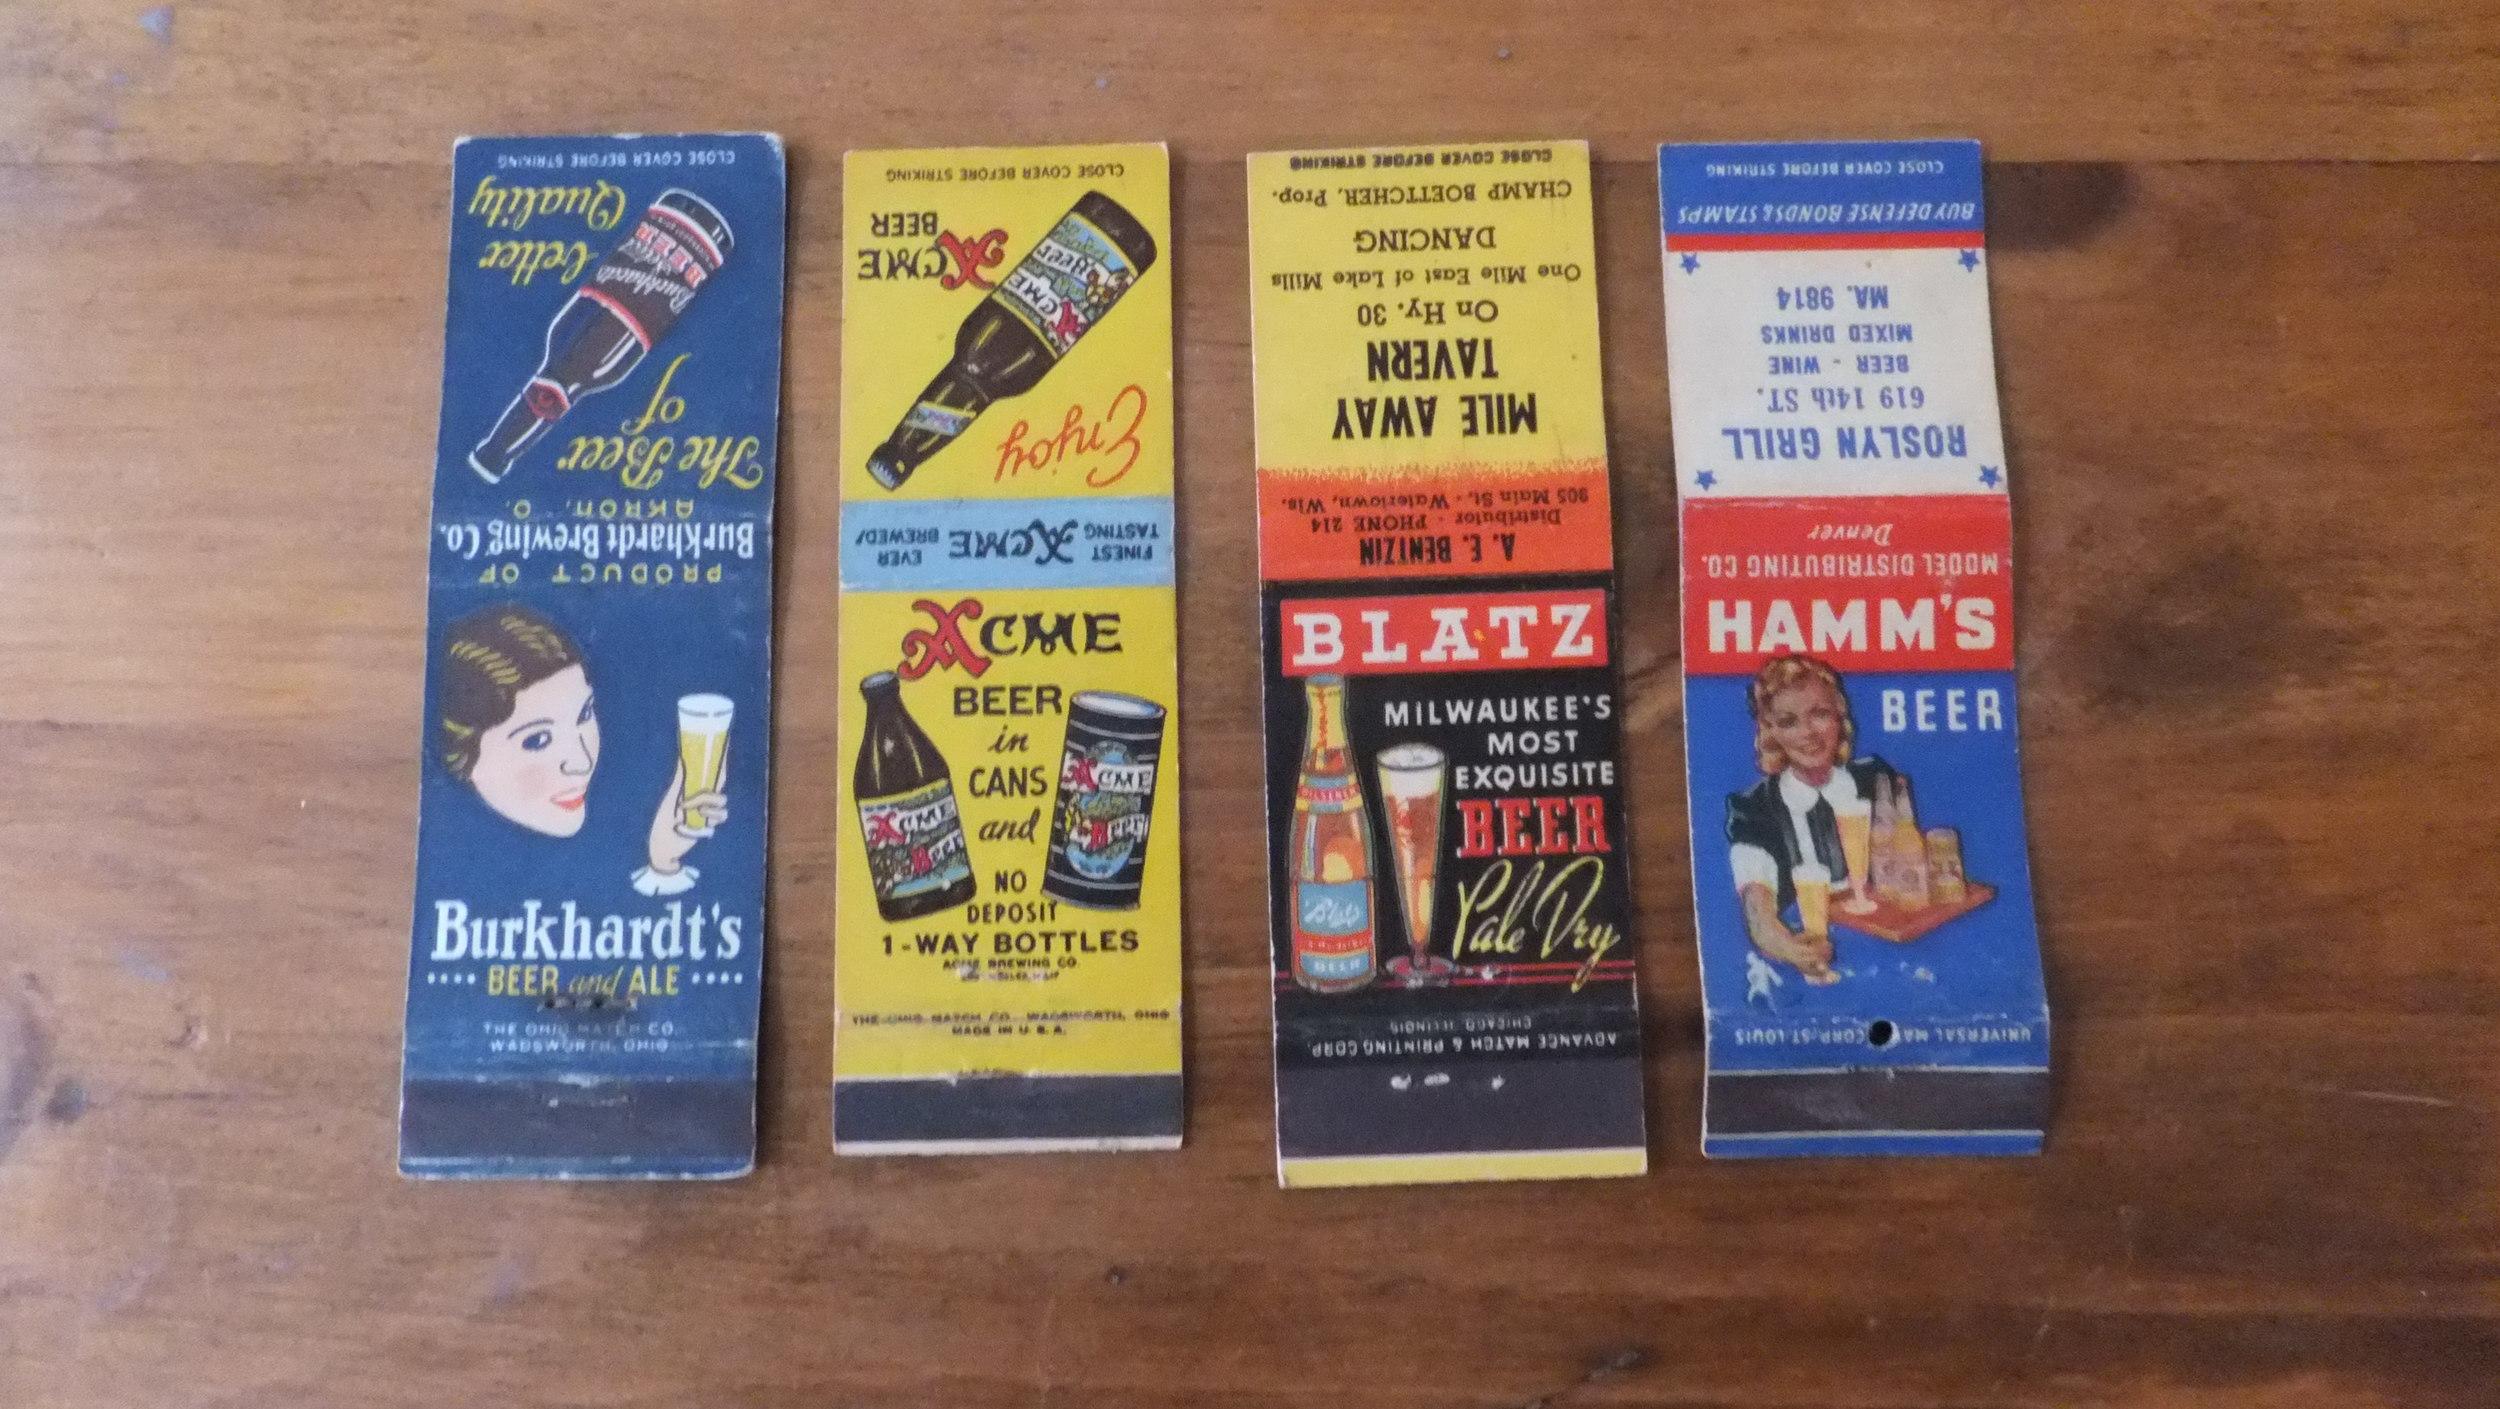 Burkhardt's (Akron, OH), Acme (California), Blatz (Milwaukee, WI), Hamm's (St.Paul, MN).